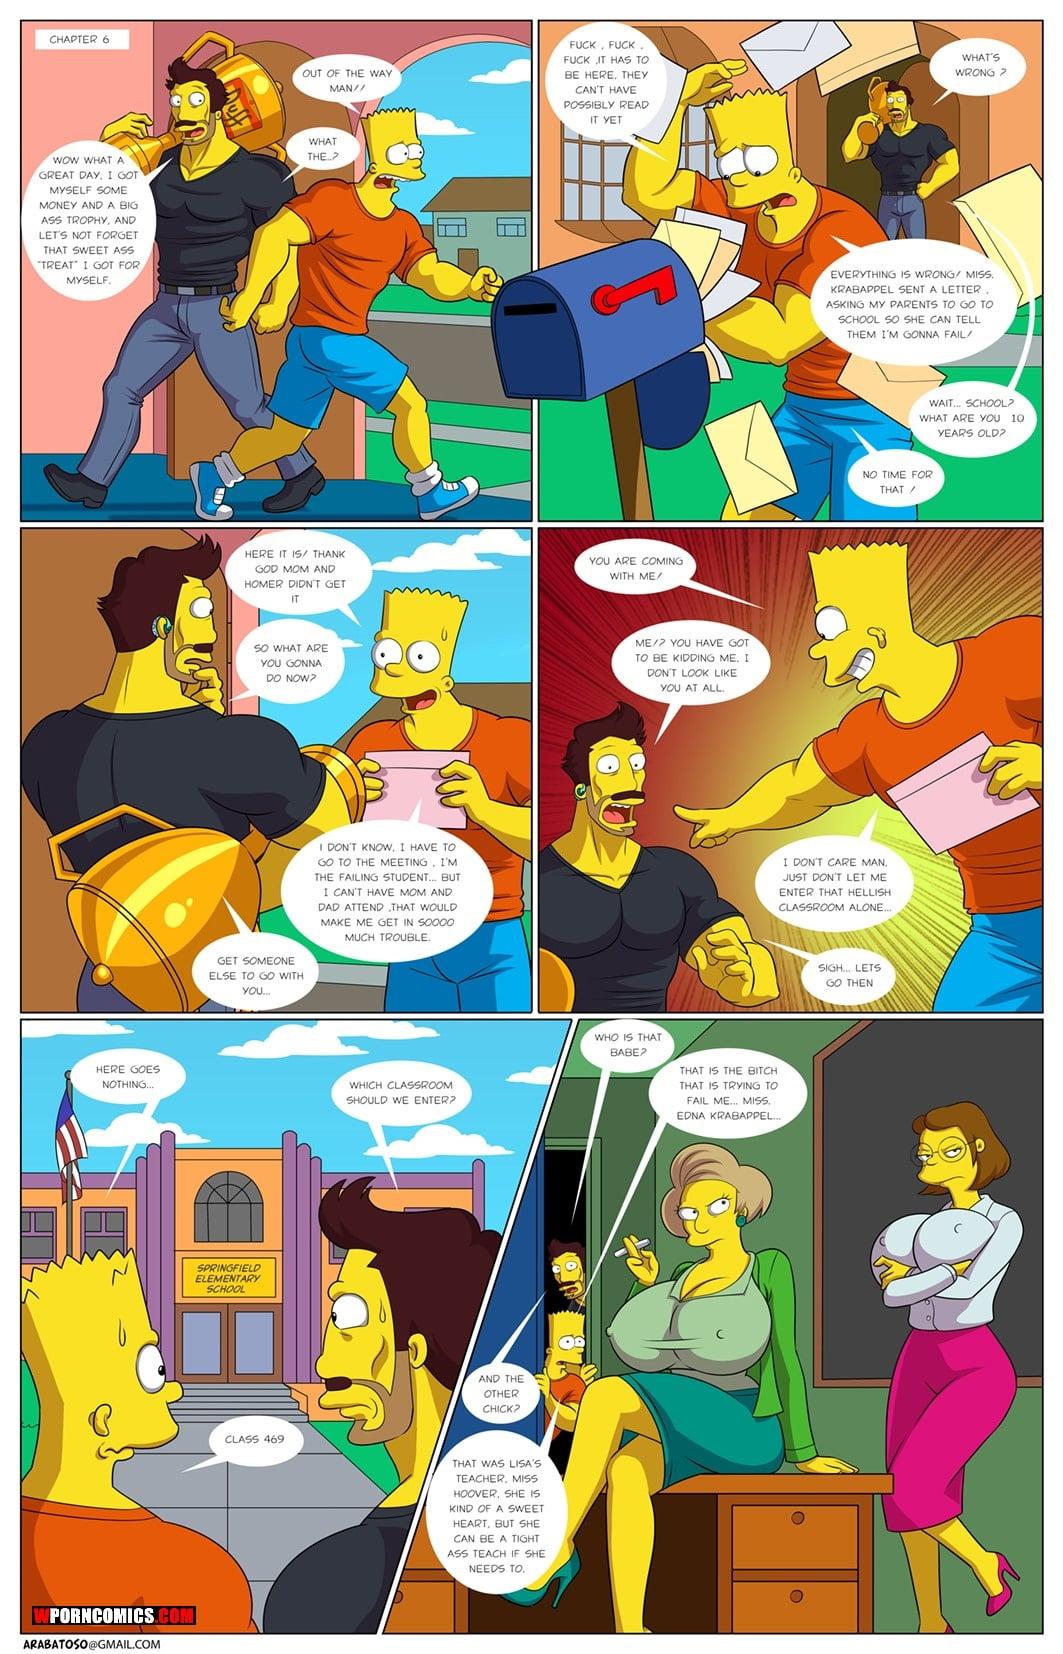 porn-comic-simpsons-darrens-adventure-part-3-2020-03-22/porn-comic-simpsons-darrens-adventure-part-3-2020-03-22-47301.jpg